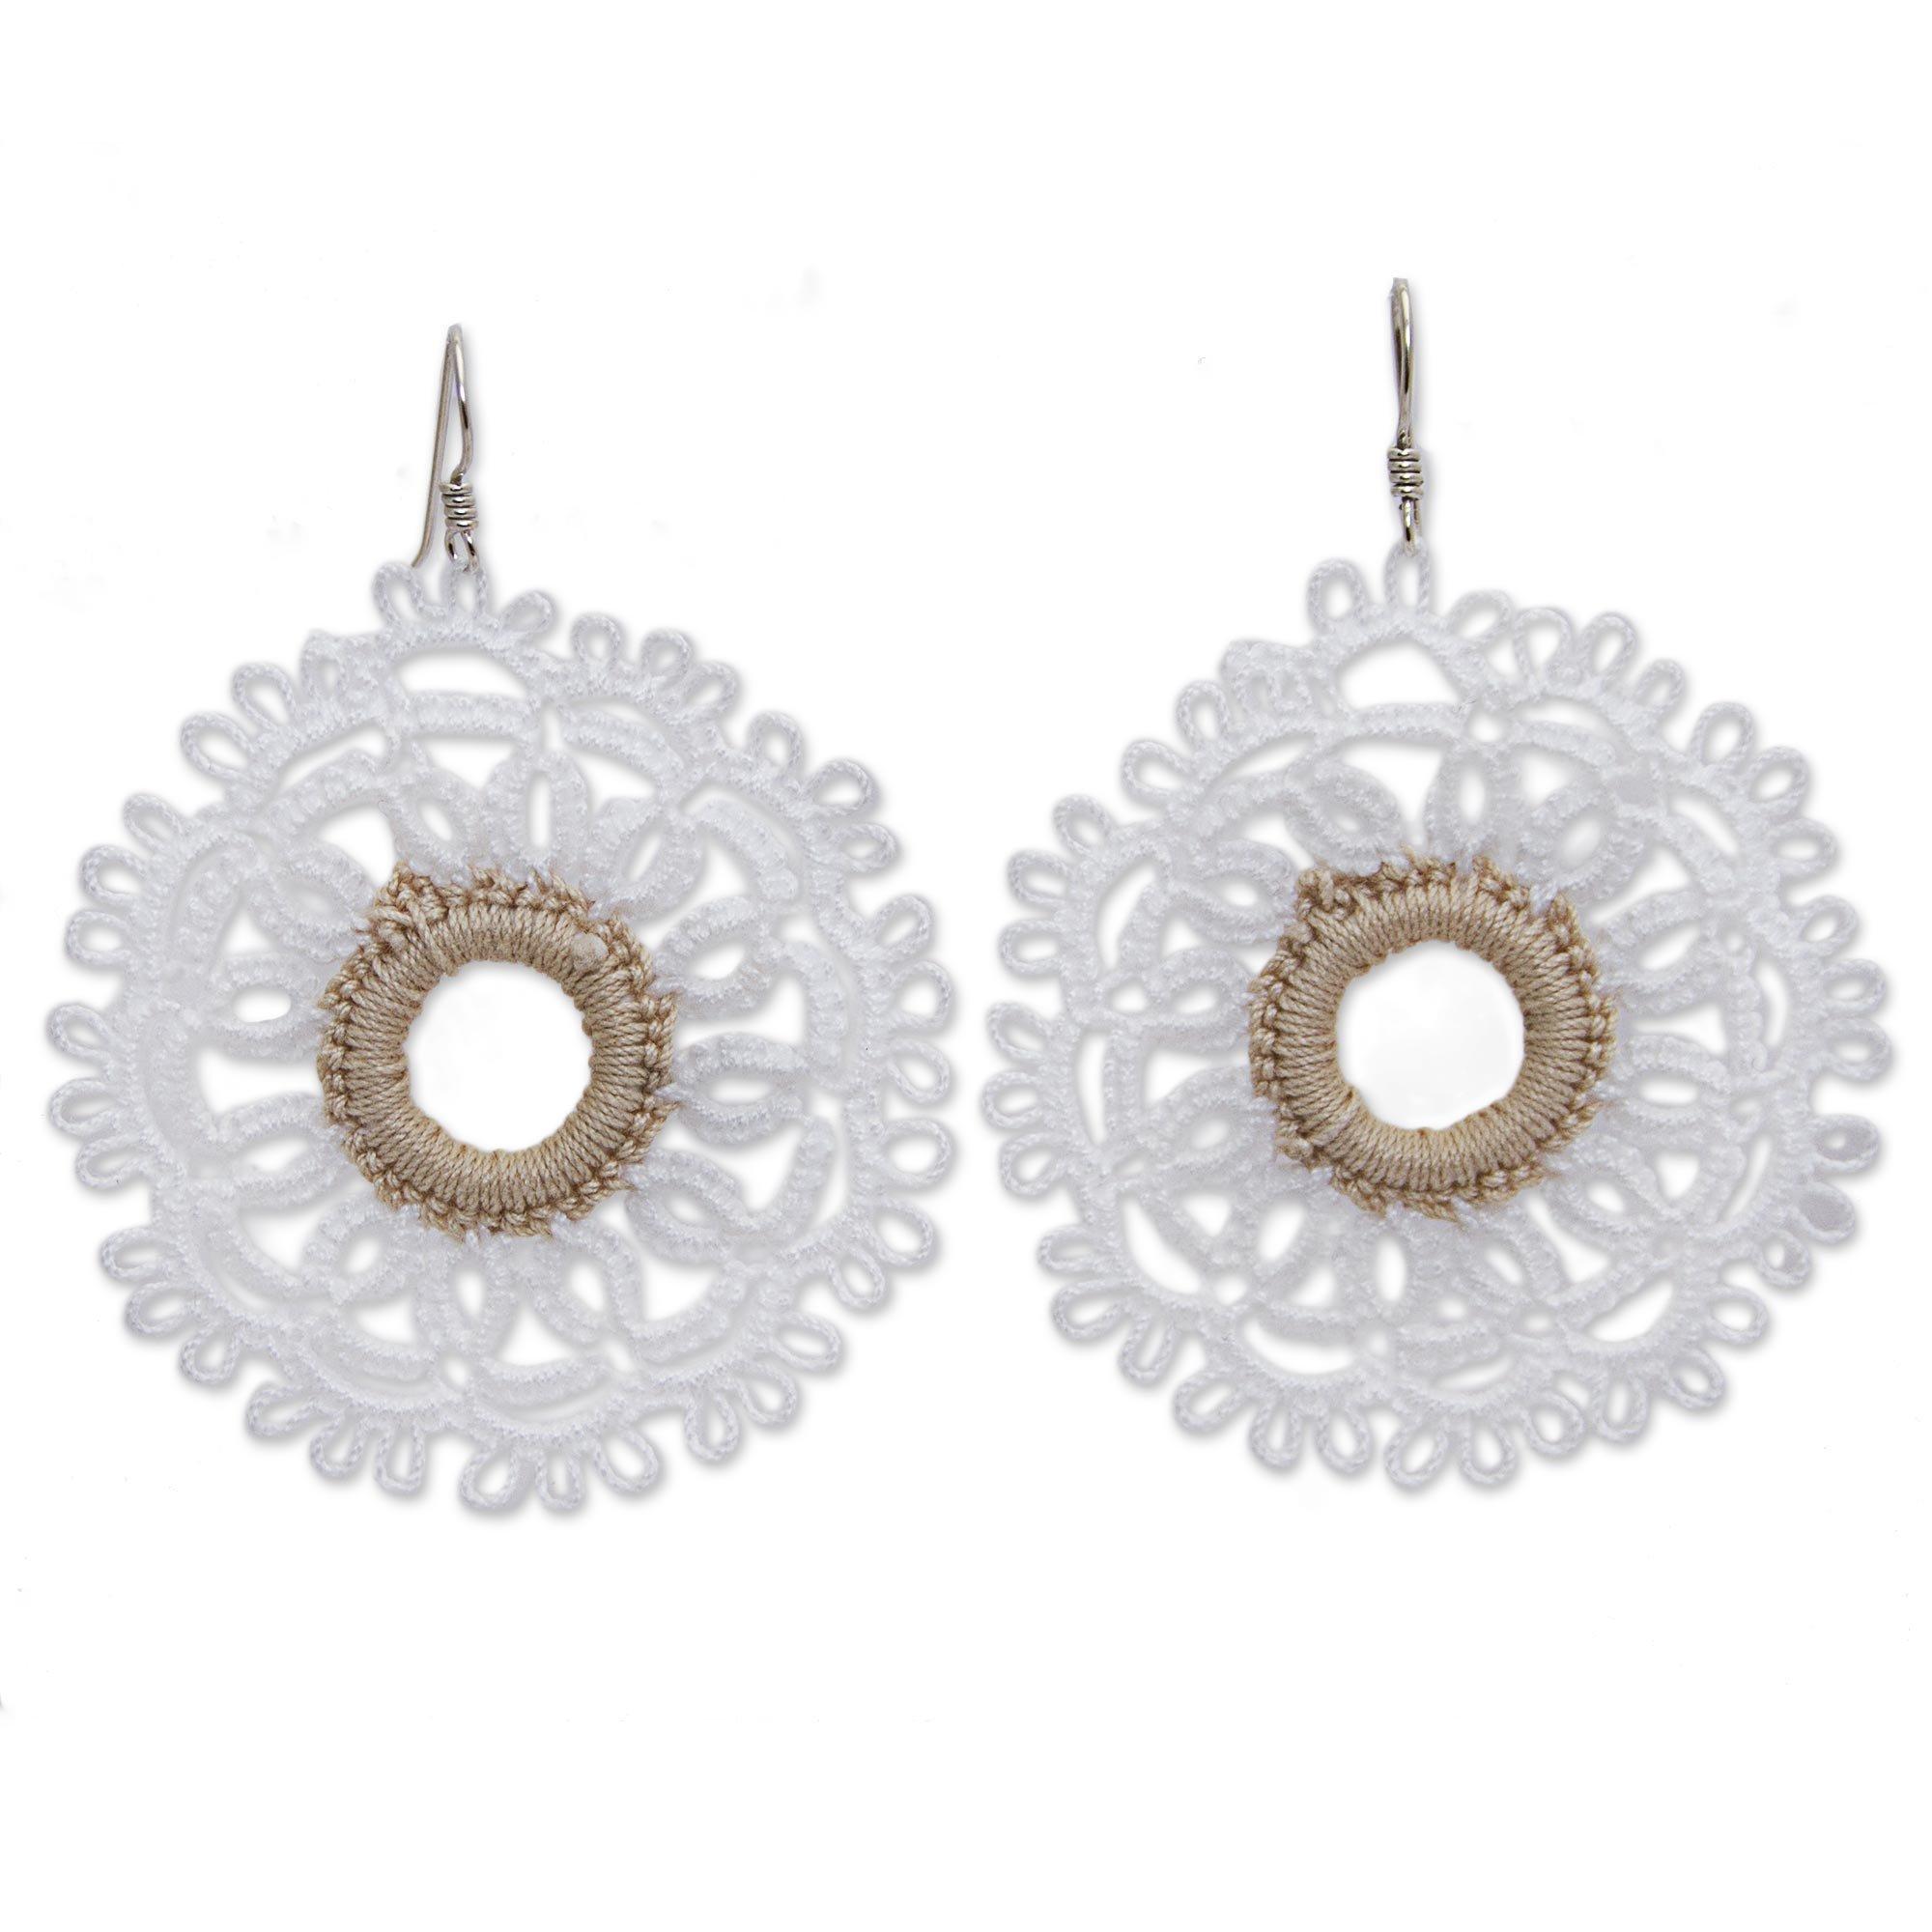 NOVICA Crochet Cotton Dangle Earrings with .925 Sterling Silver Hooks 'White Doily'